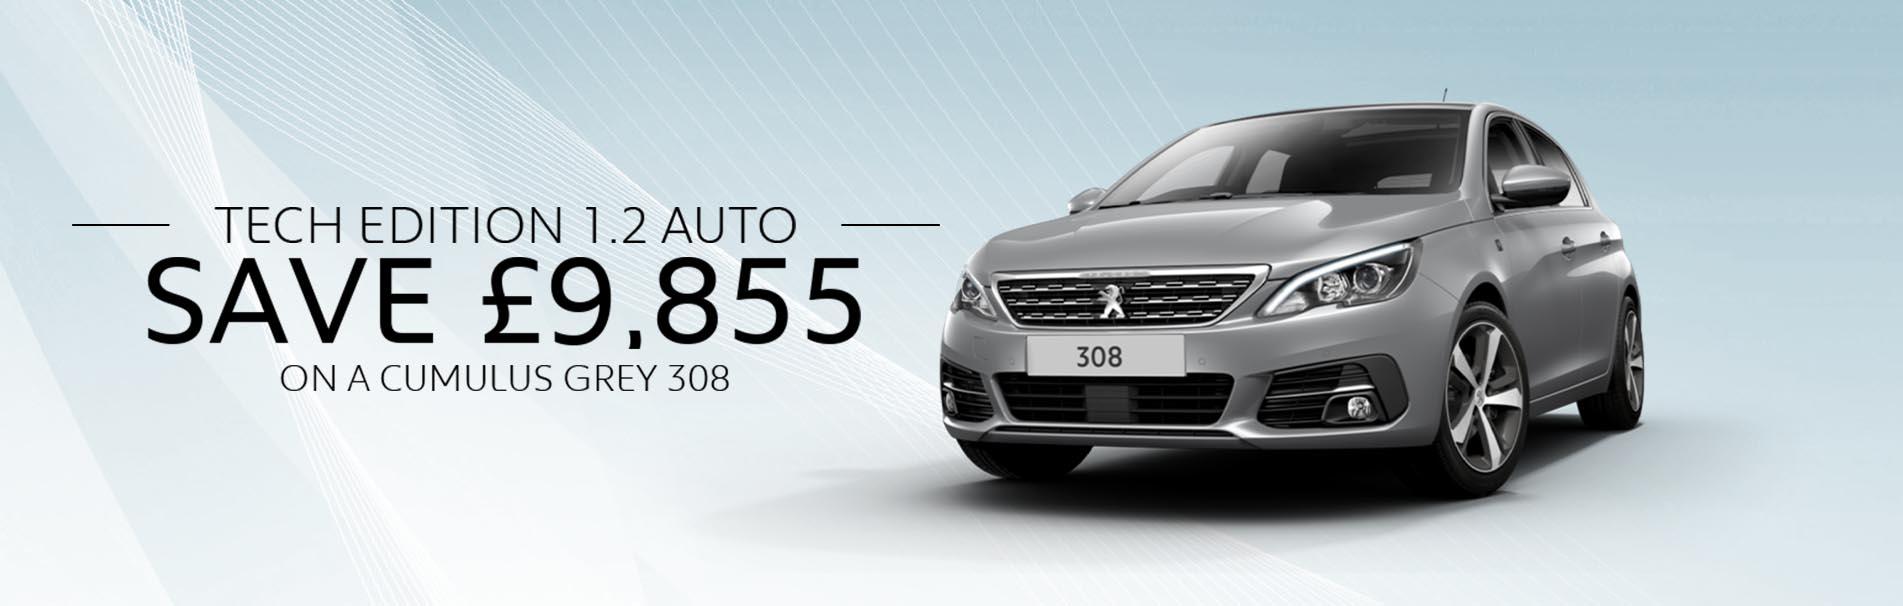 peugeot-308-cumulus-grey-tech-edition-auto-saving-2020-sli